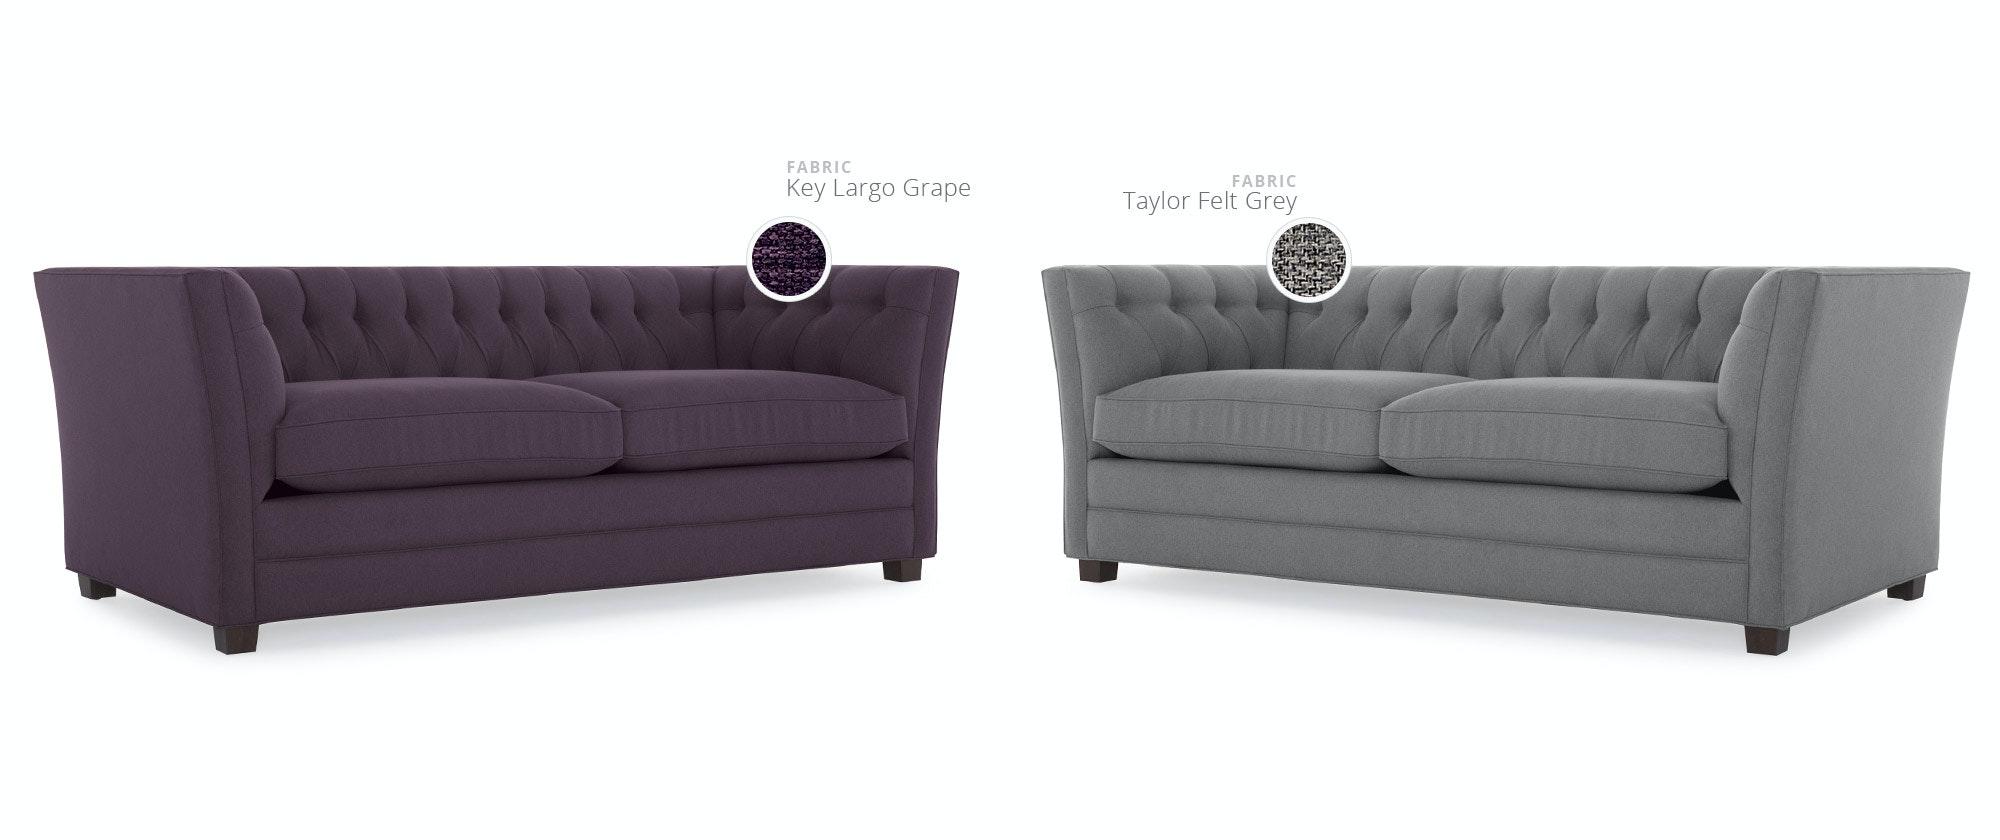 pee kensington leather sofa mid century modern sofas under 1000 trenzseater - thesofa